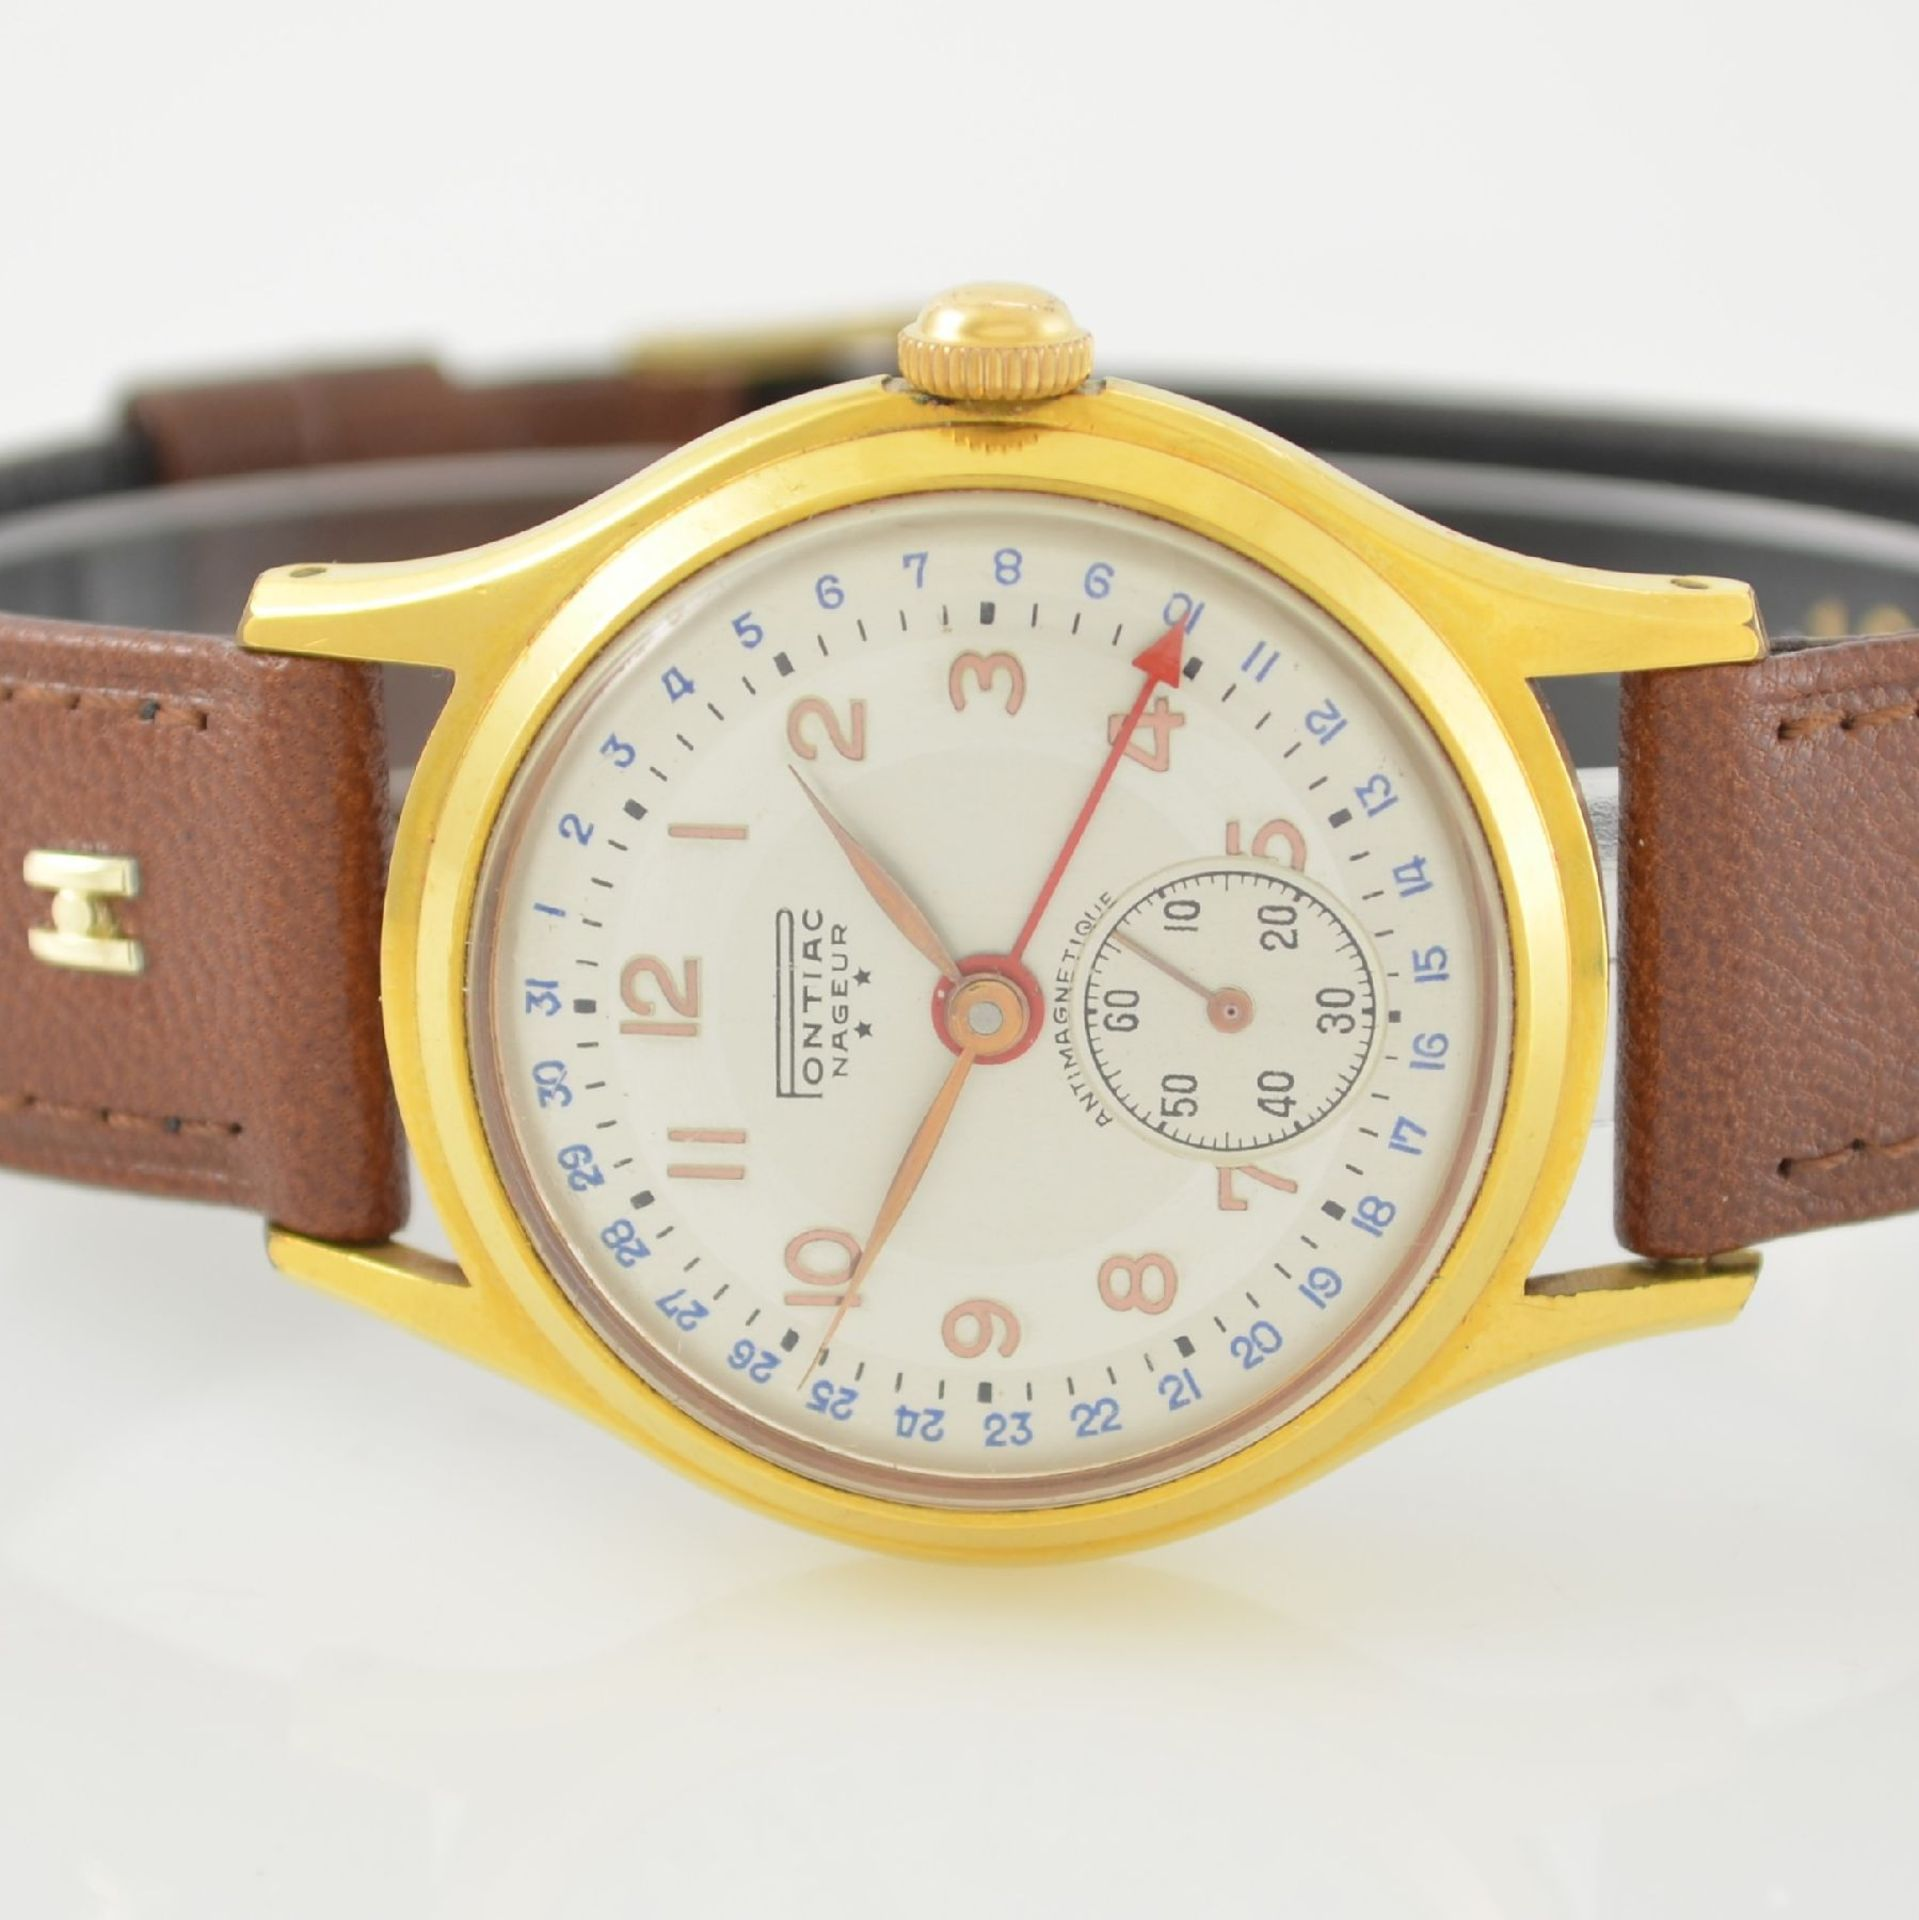 Konvolut: 2 Armbanduhren mit Kalender bzw. Datum, Schweiz um 1950-1960, Handaufzug, 1) NACAR m. - Bild 8 aus 12